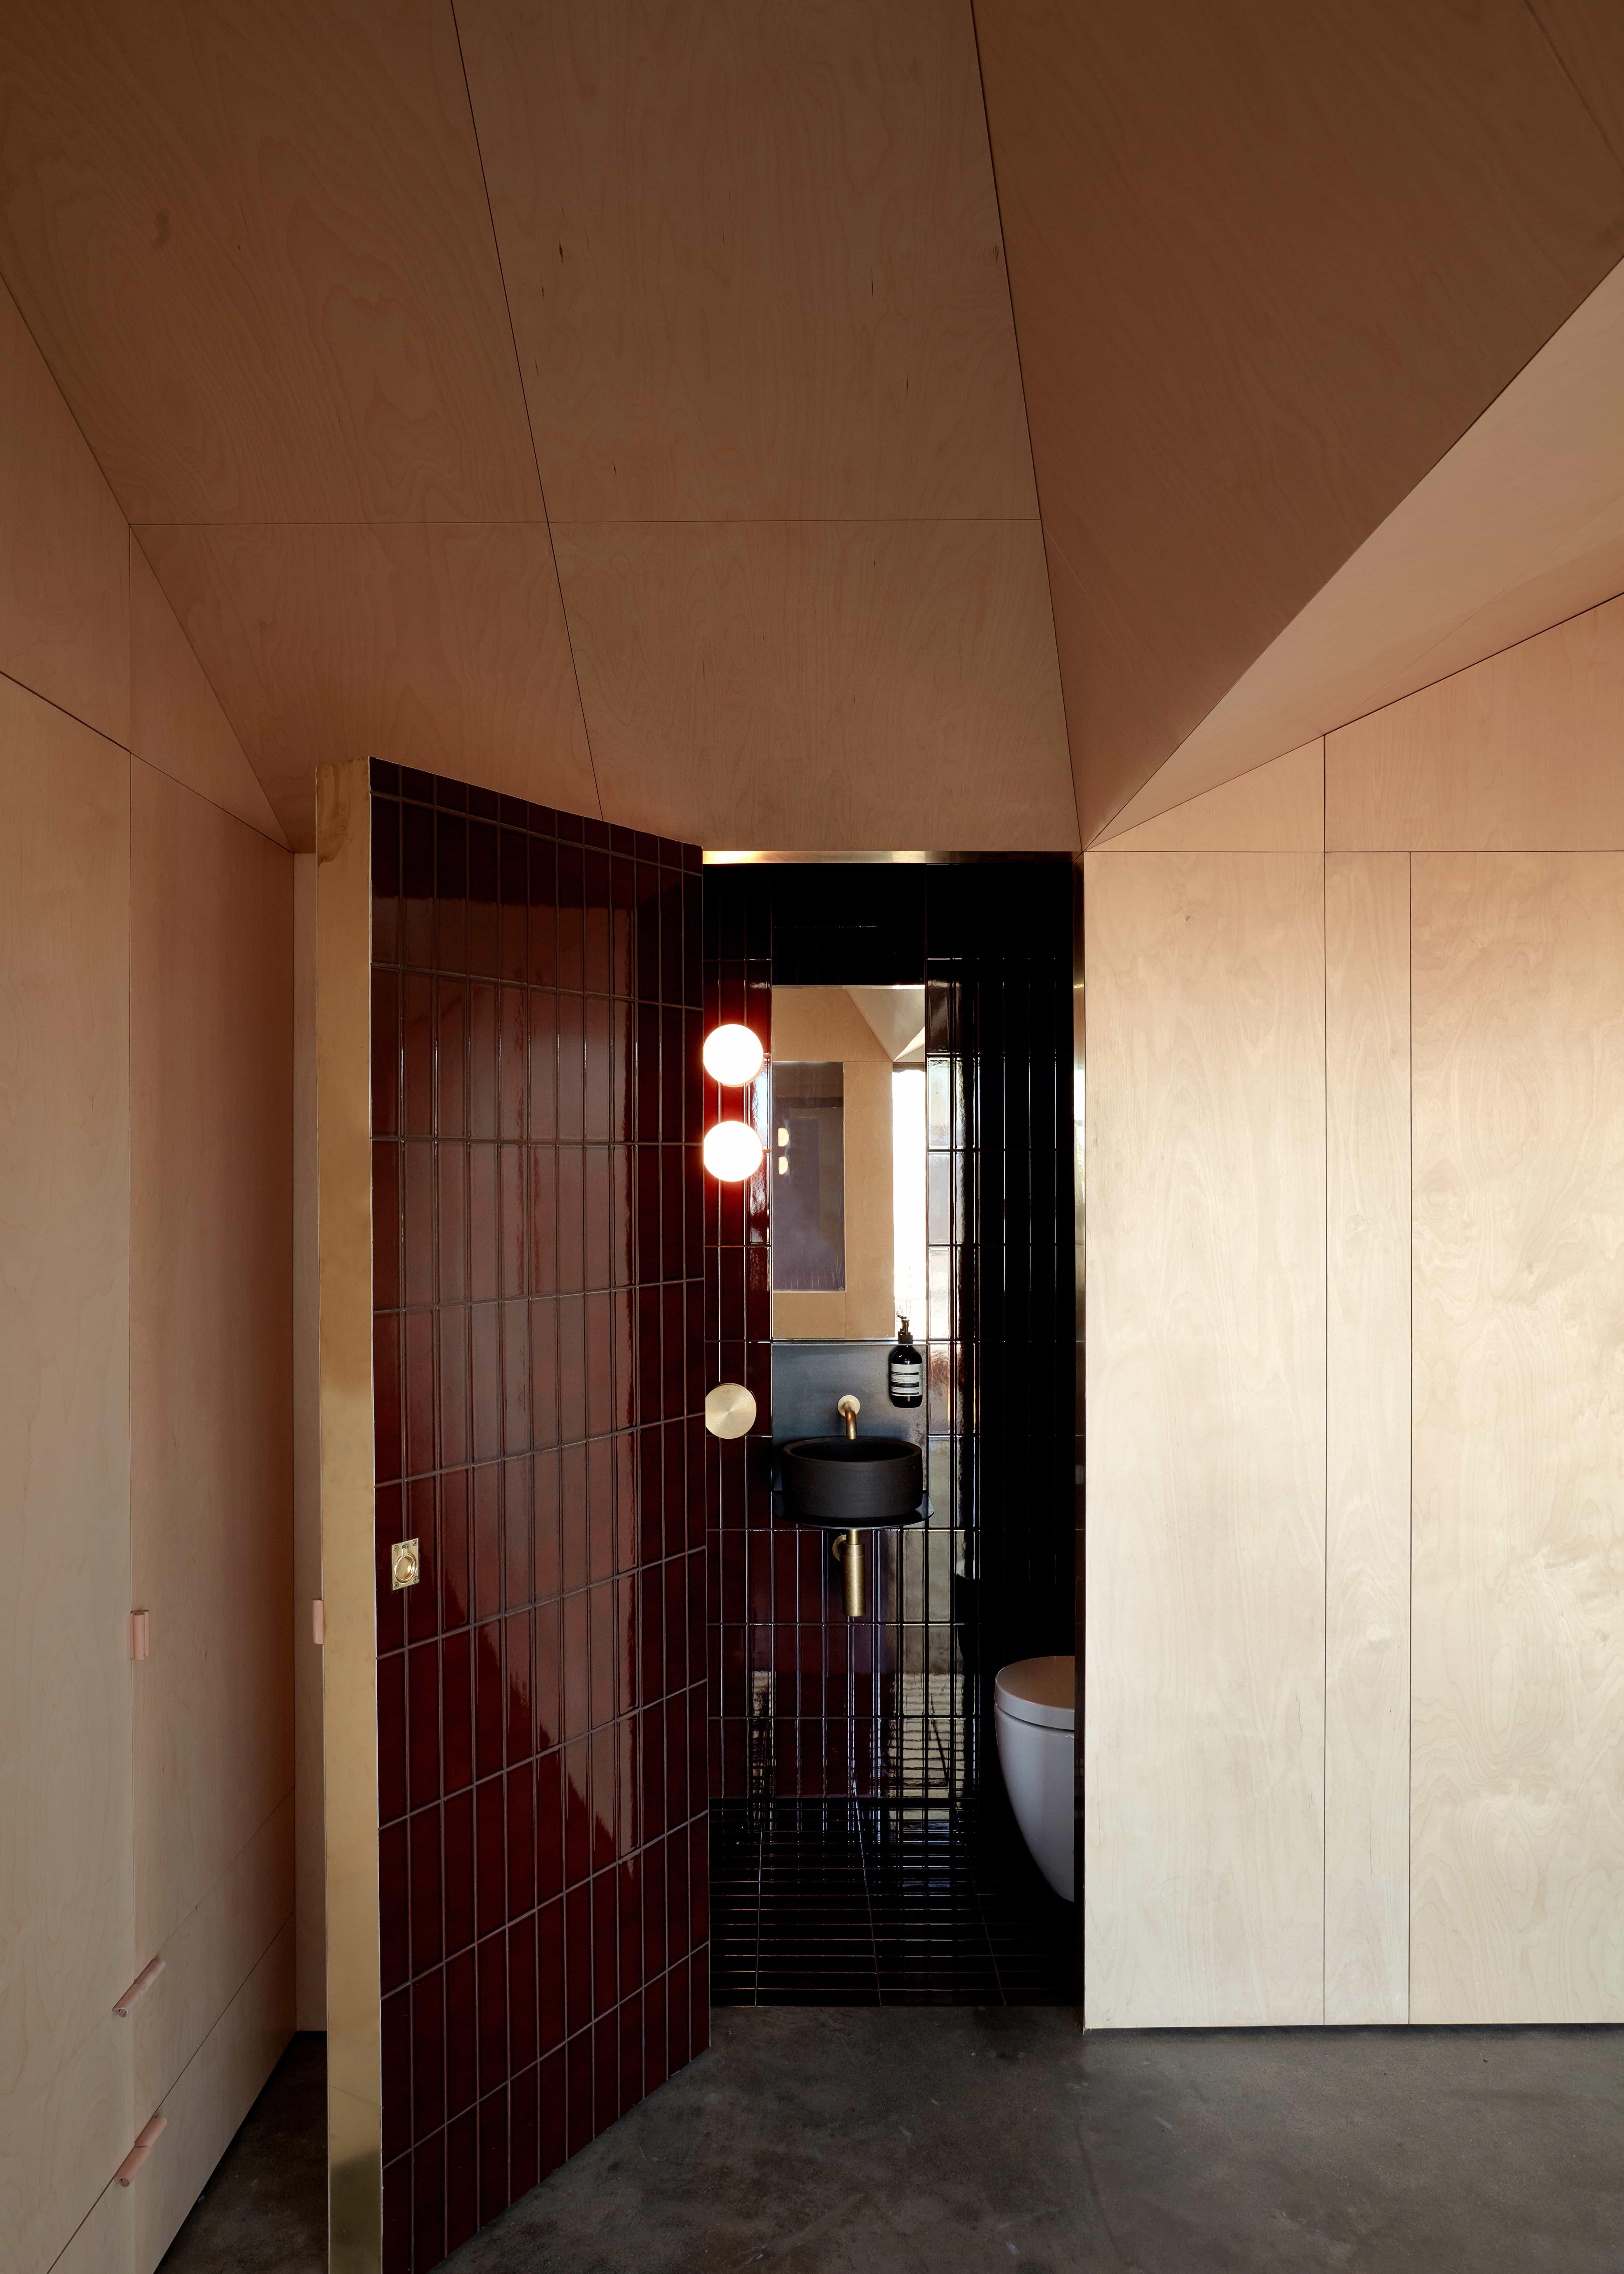 Gallery Of #thebaetas By Liz Walsh & Alex Nielsen Local Australian Bespoke Small Scale Architecture Sandy Bay, Tas Image 8